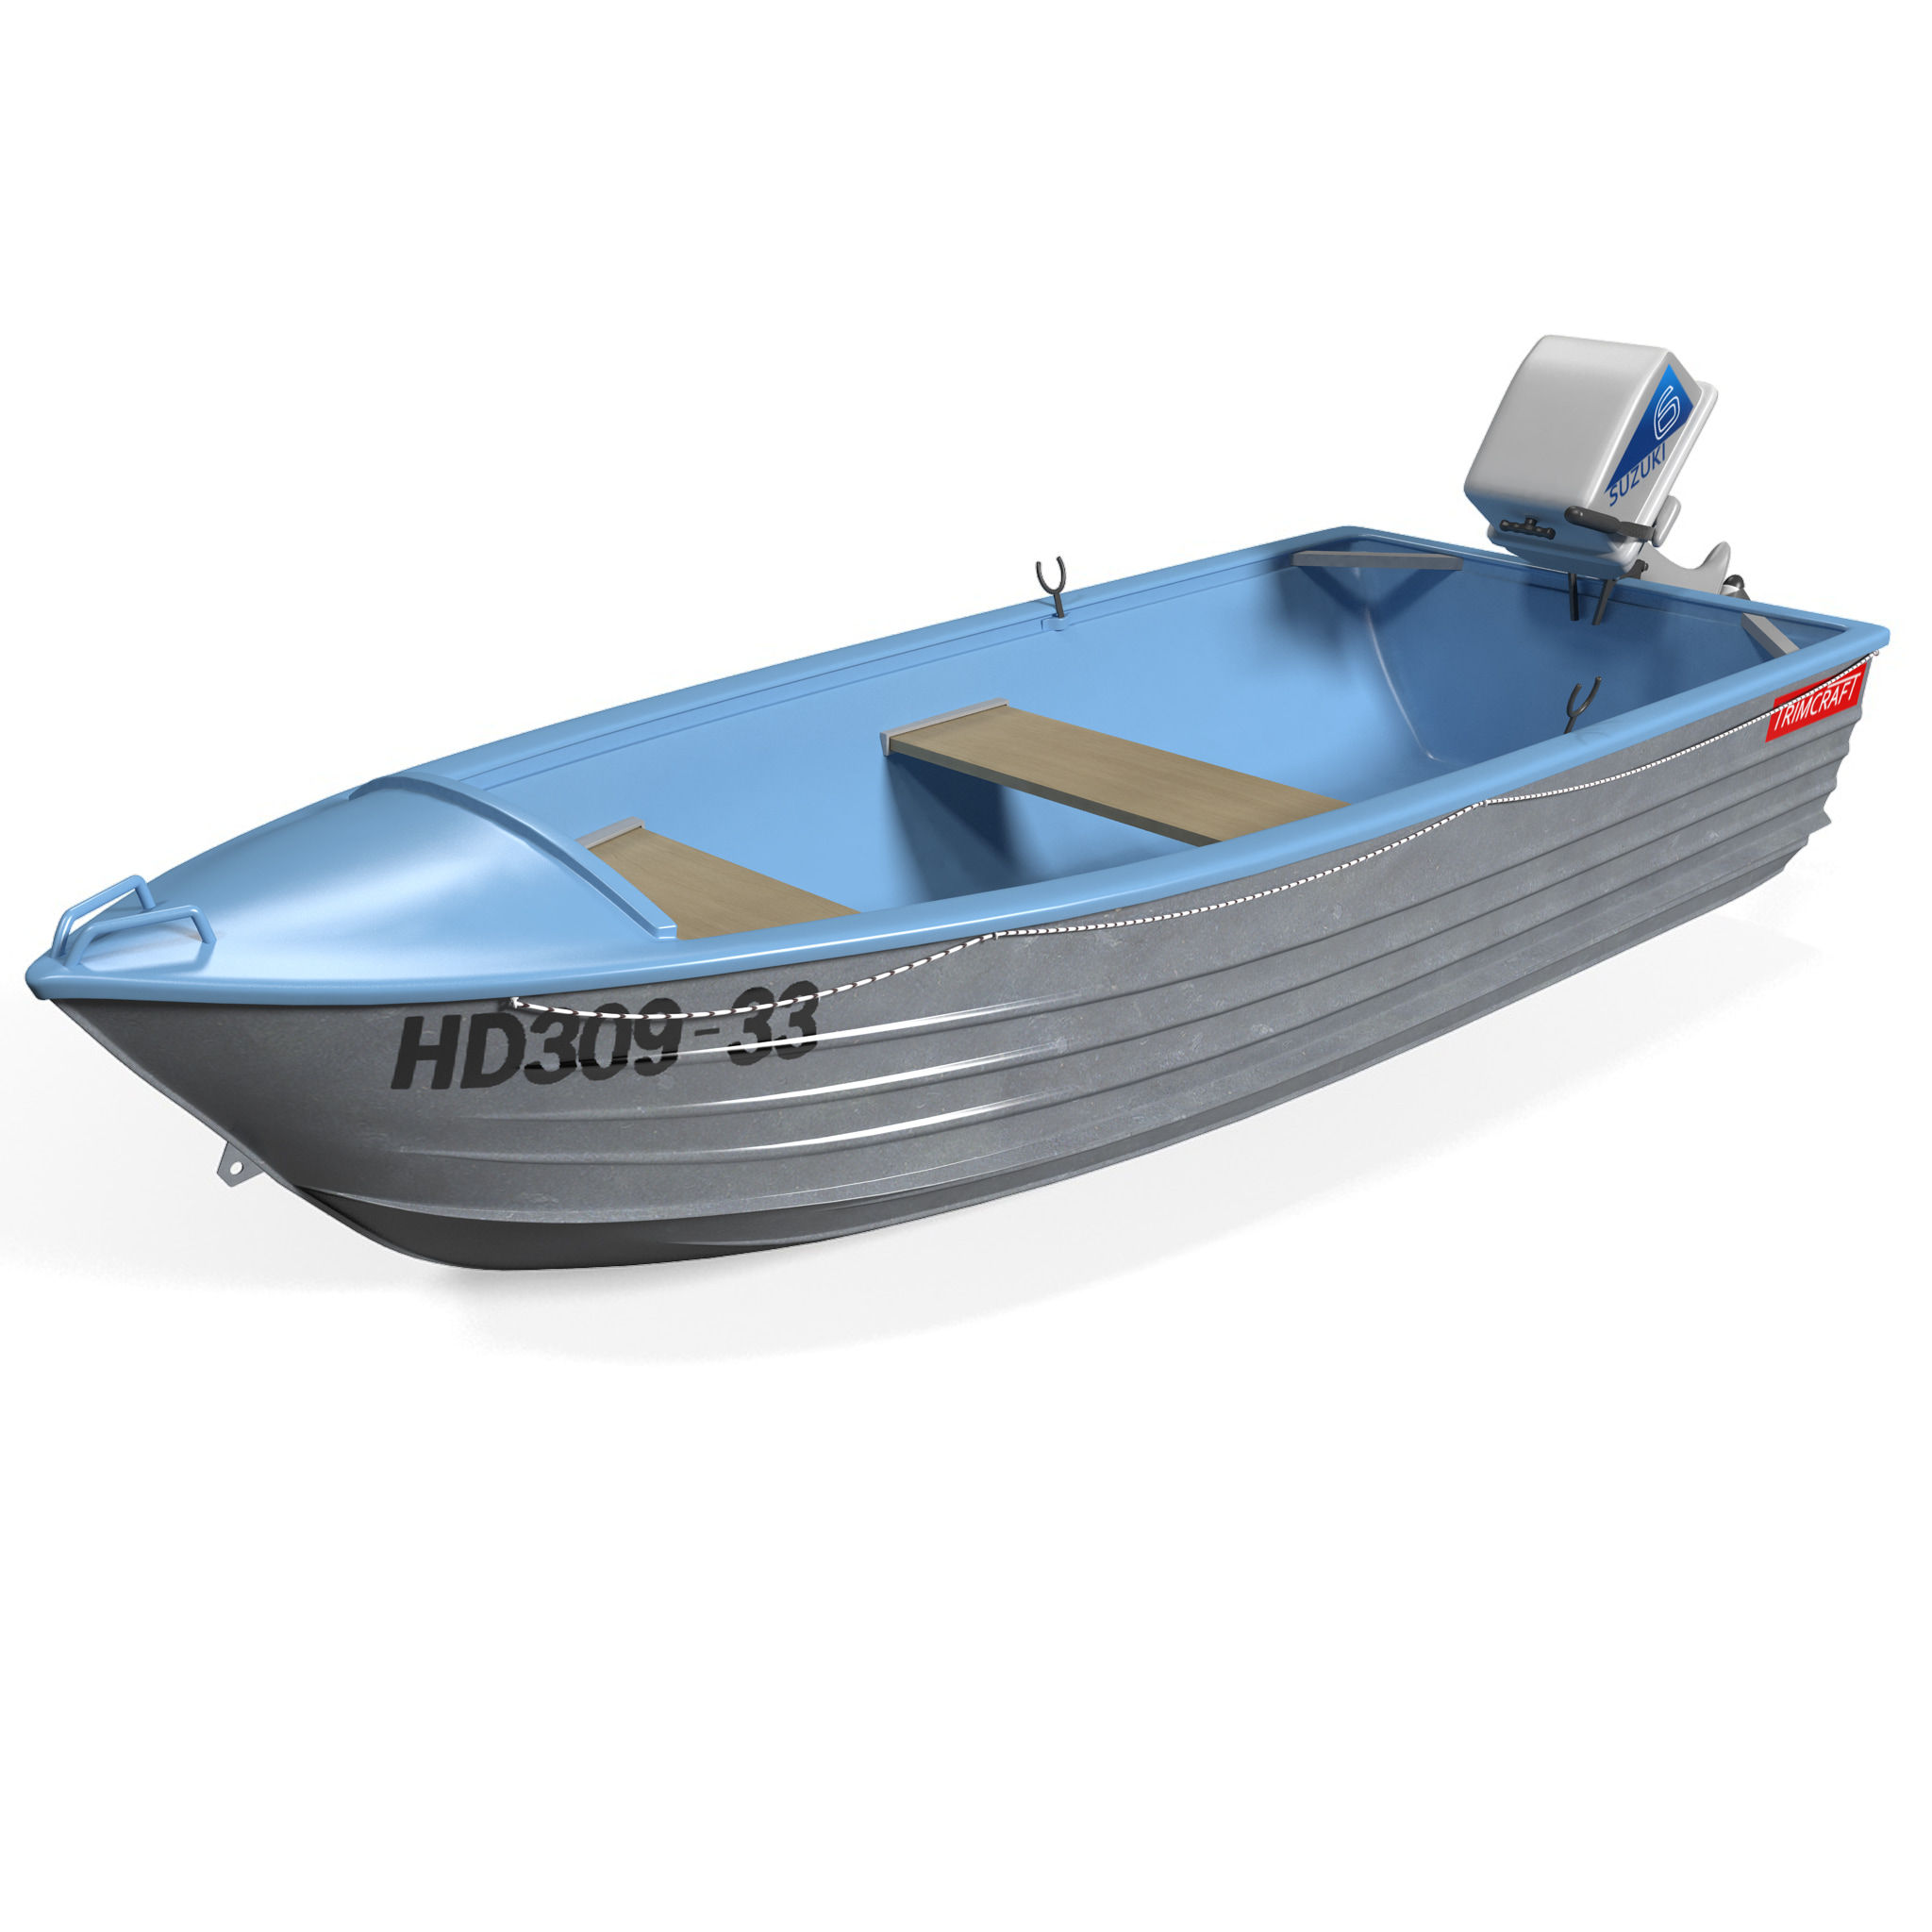 Trimcraft Boat 2_2.jpg